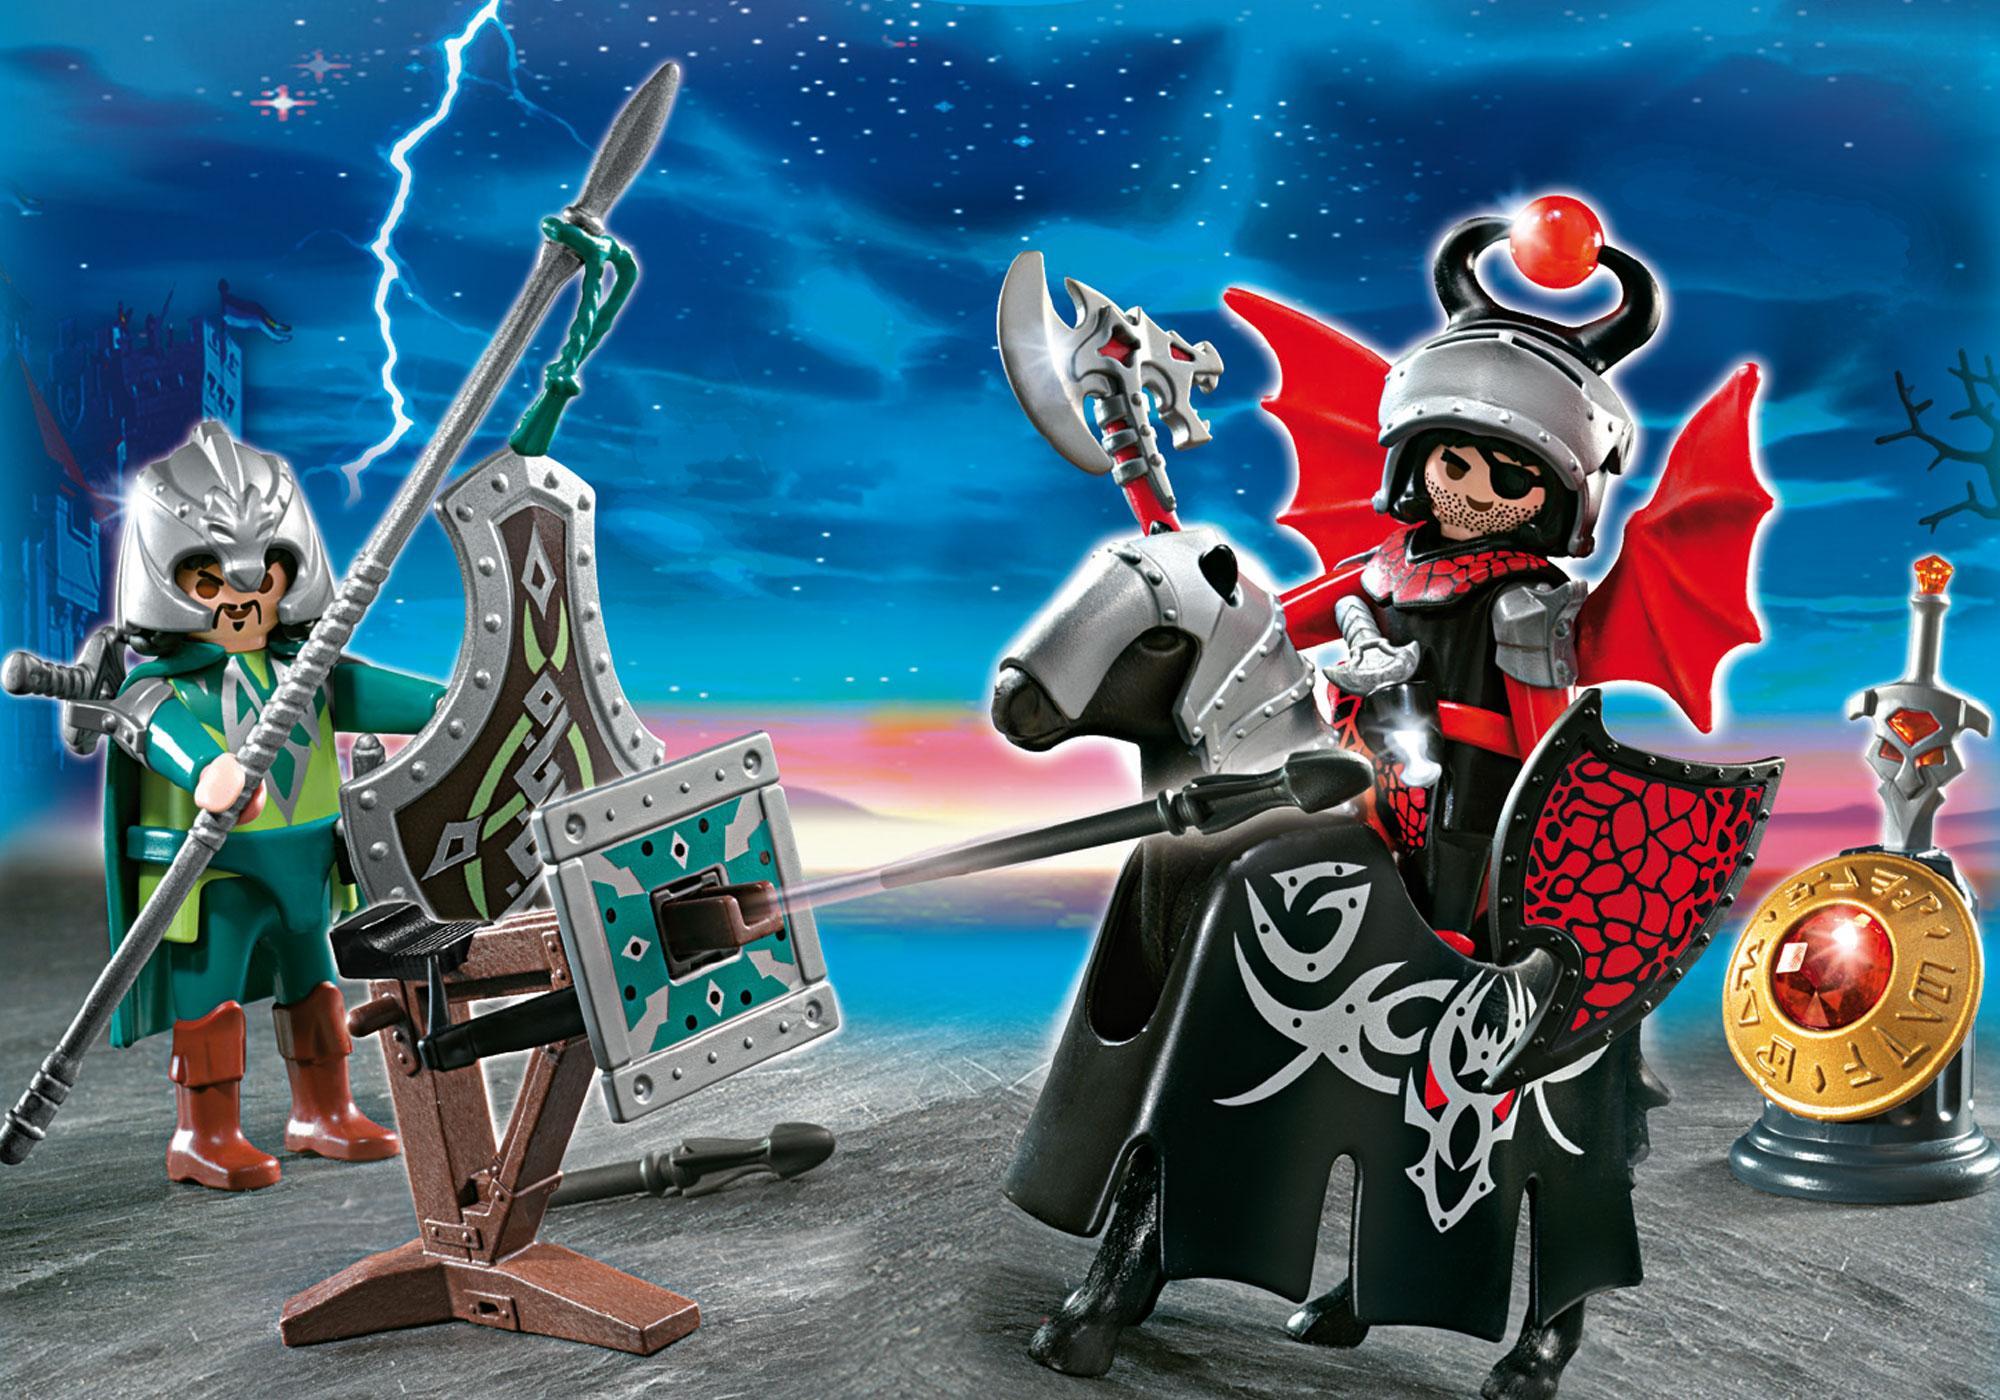 http://media.playmobil.com/i/playmobil/5890_product_detail/Carrying Case Dragonland